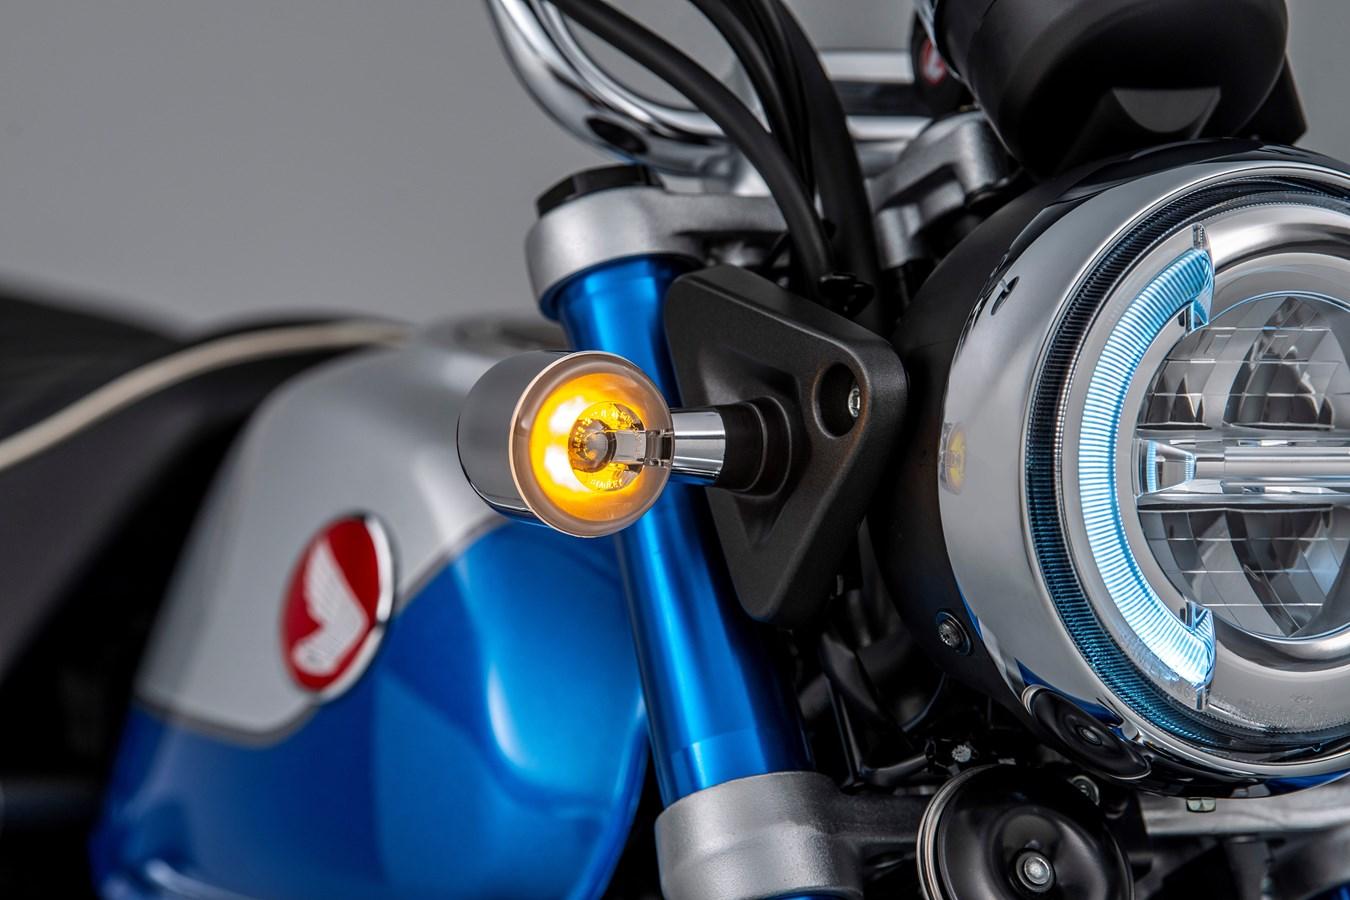 2021 Honda Monkey 125 Headlights